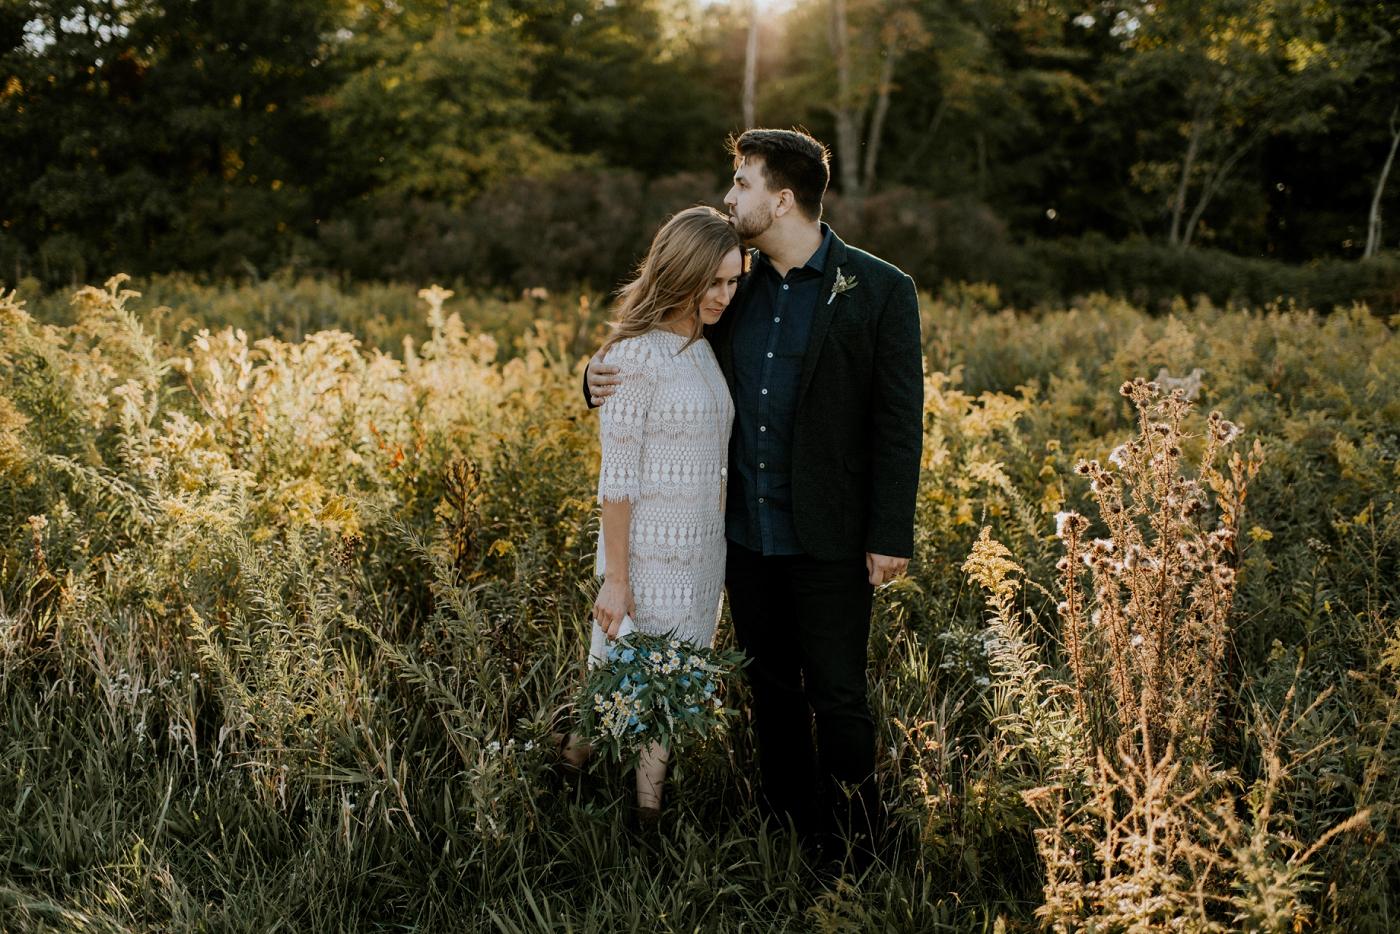 Wildflower-Field-Elopement-Vow-Renewal_Lisa+Chad_MJPHOTO-52.JPG